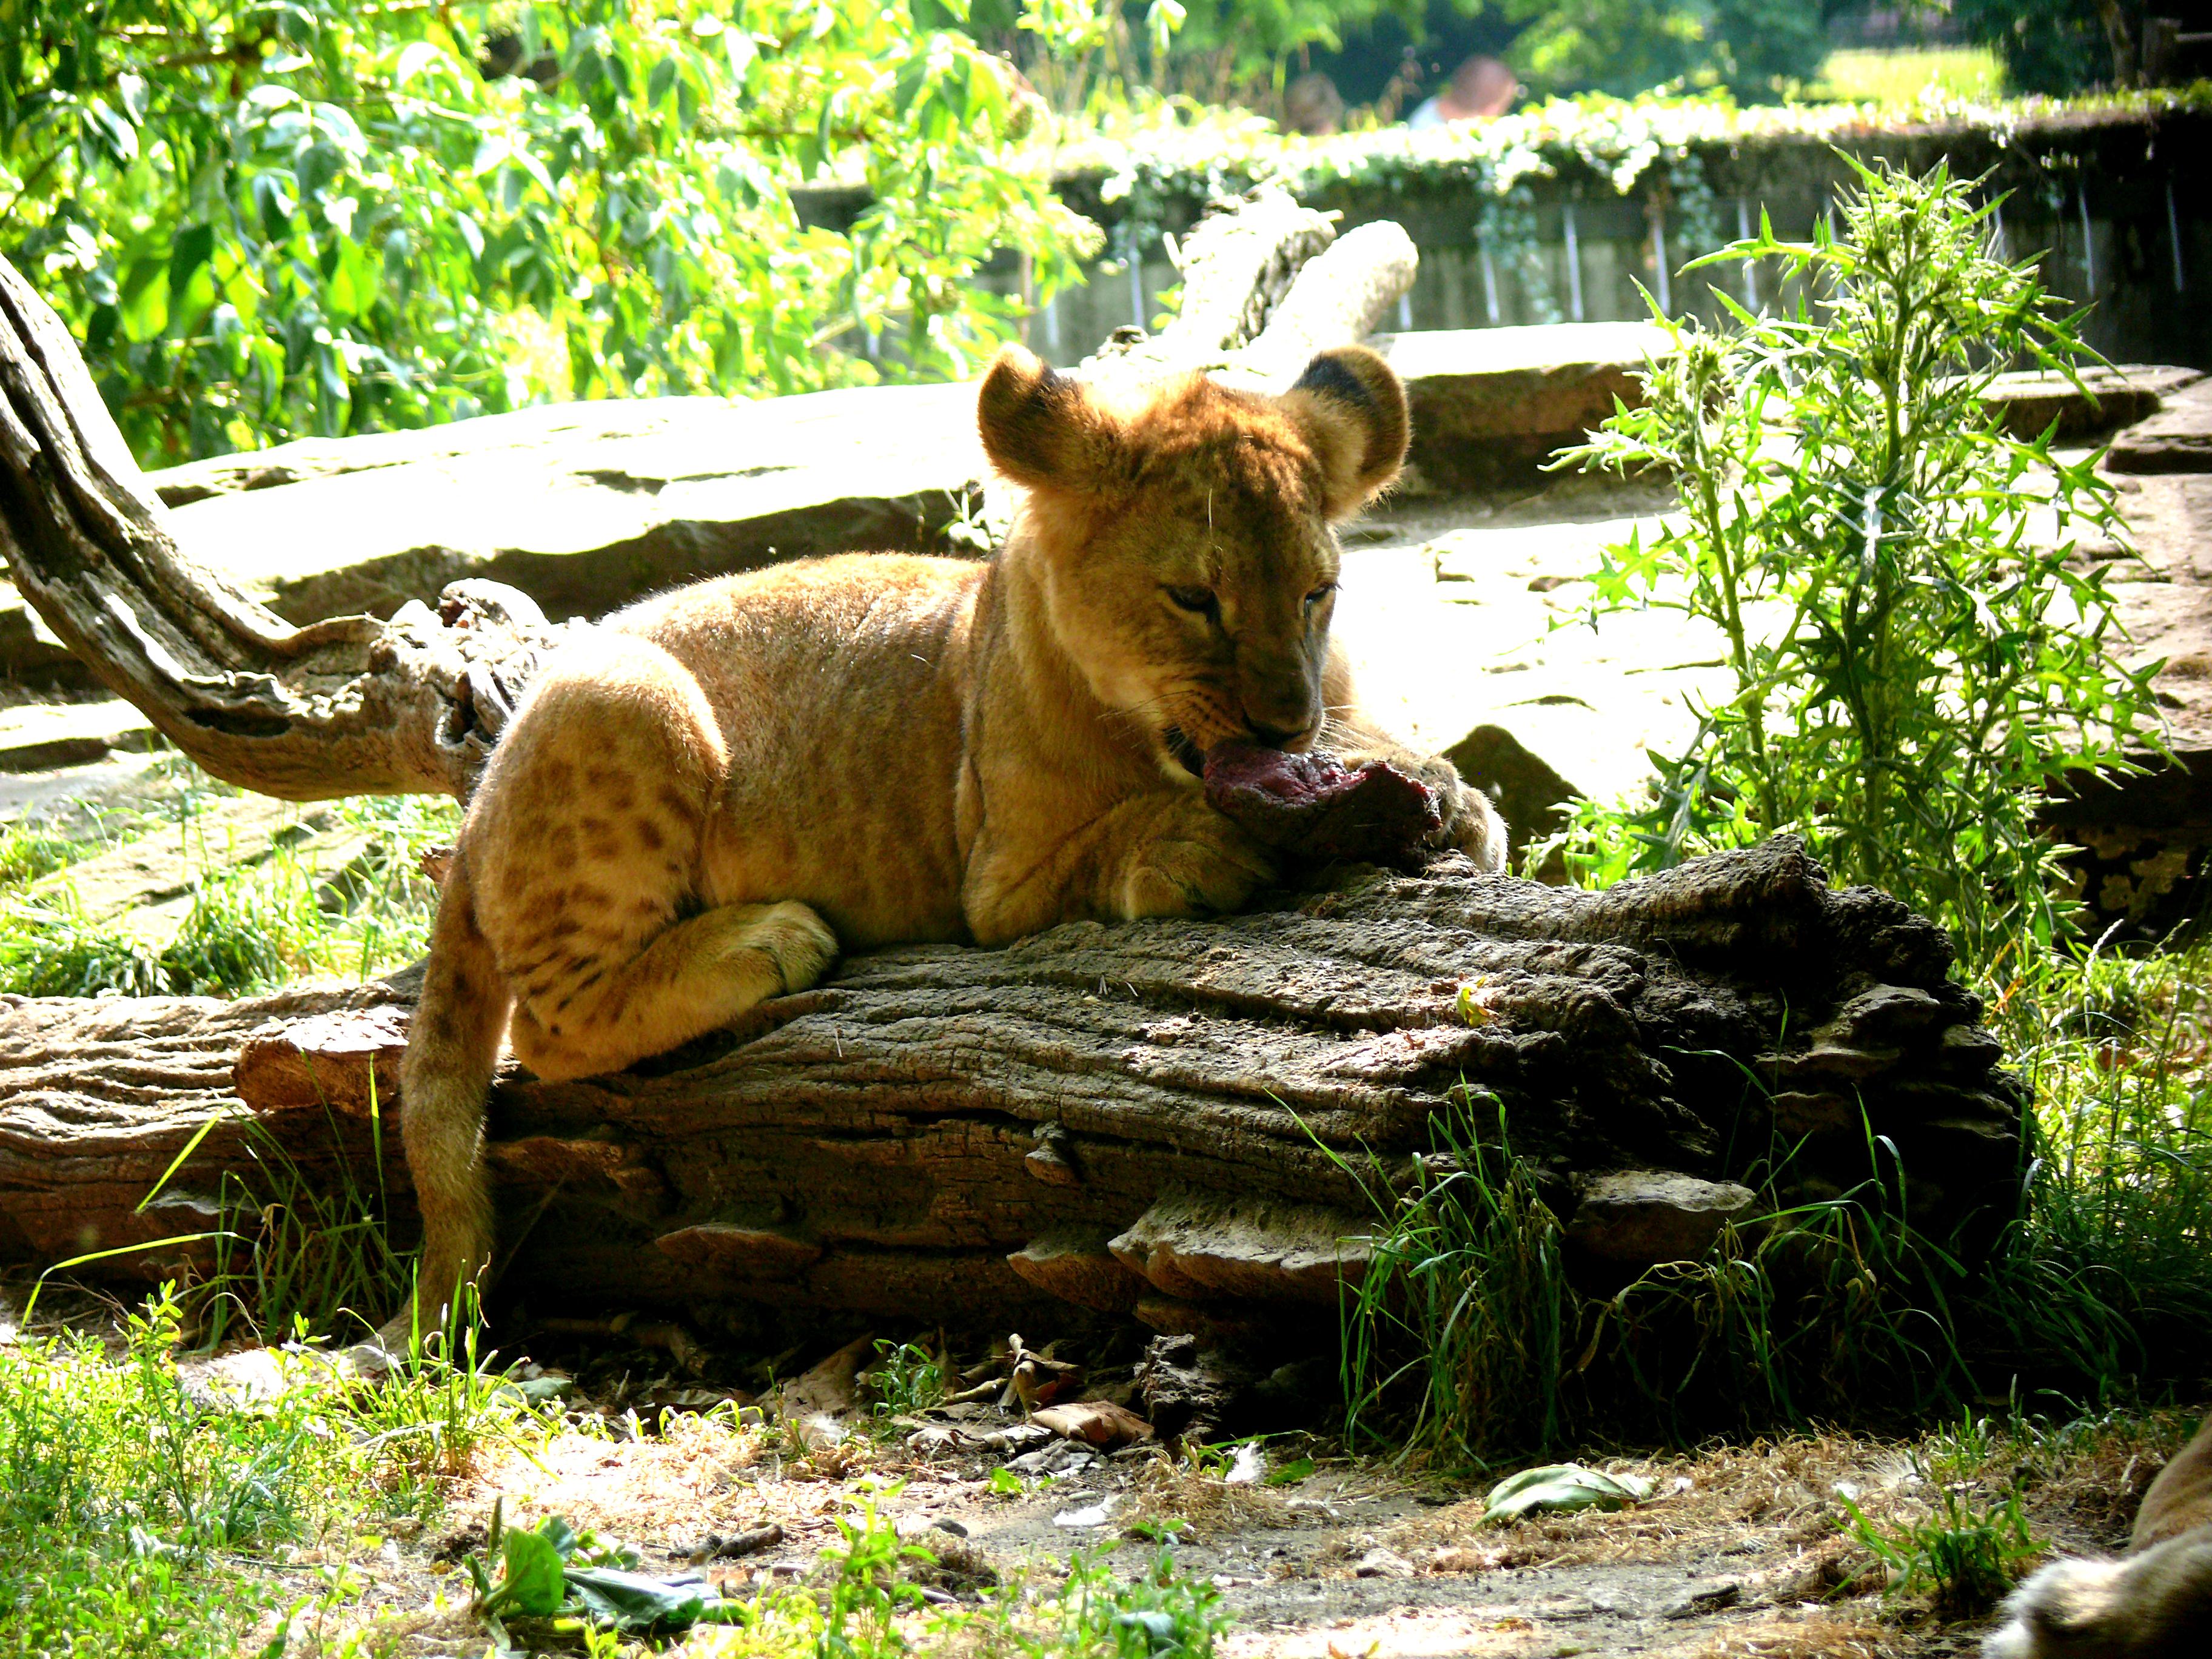 medien zoo dortmund freizeit kultur tourismus stadtportal. Black Bedroom Furniture Sets. Home Design Ideas